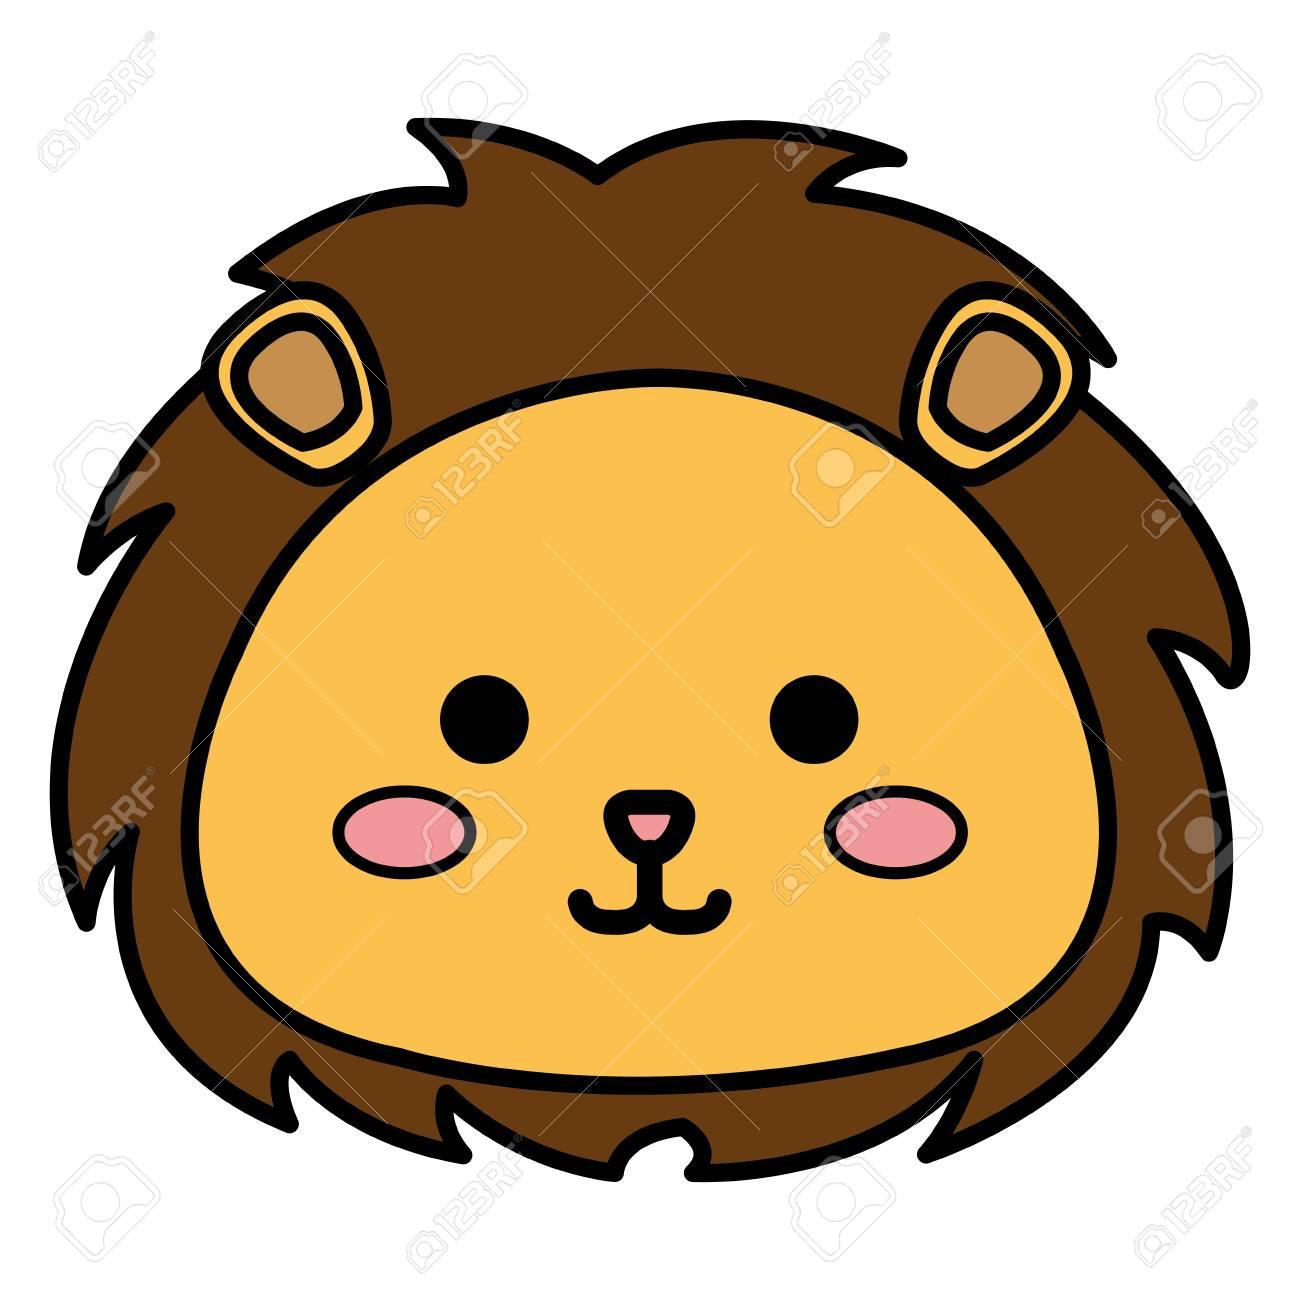 hight resolution of stuffed animal lion icon vector illustration design graphic stock vector 80839157